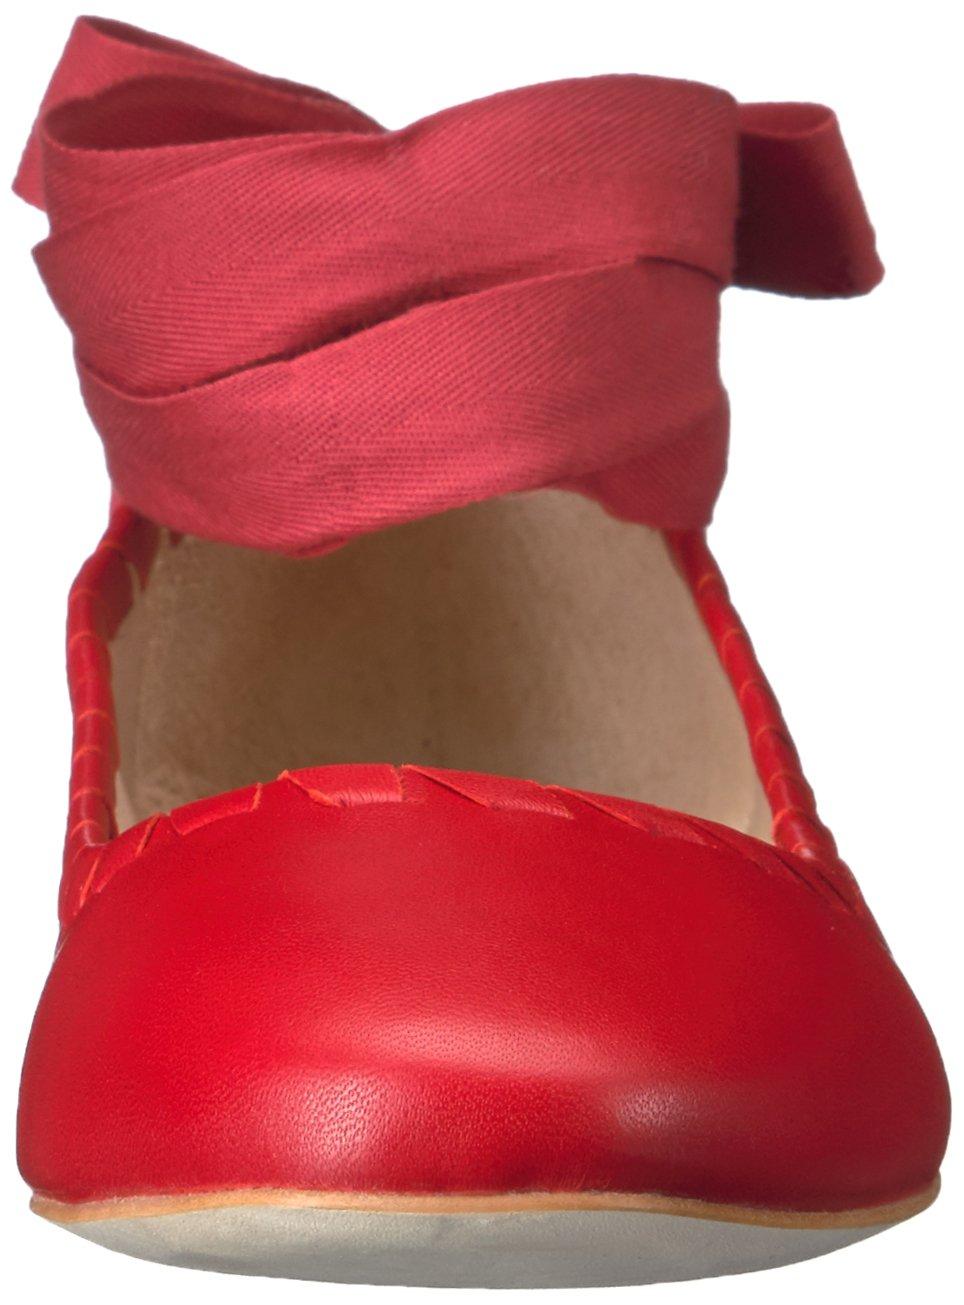 Via Spiga Women's Baylie Ballet Flat B01LA67TEC 9 B(M) US|Fireball Red Leather